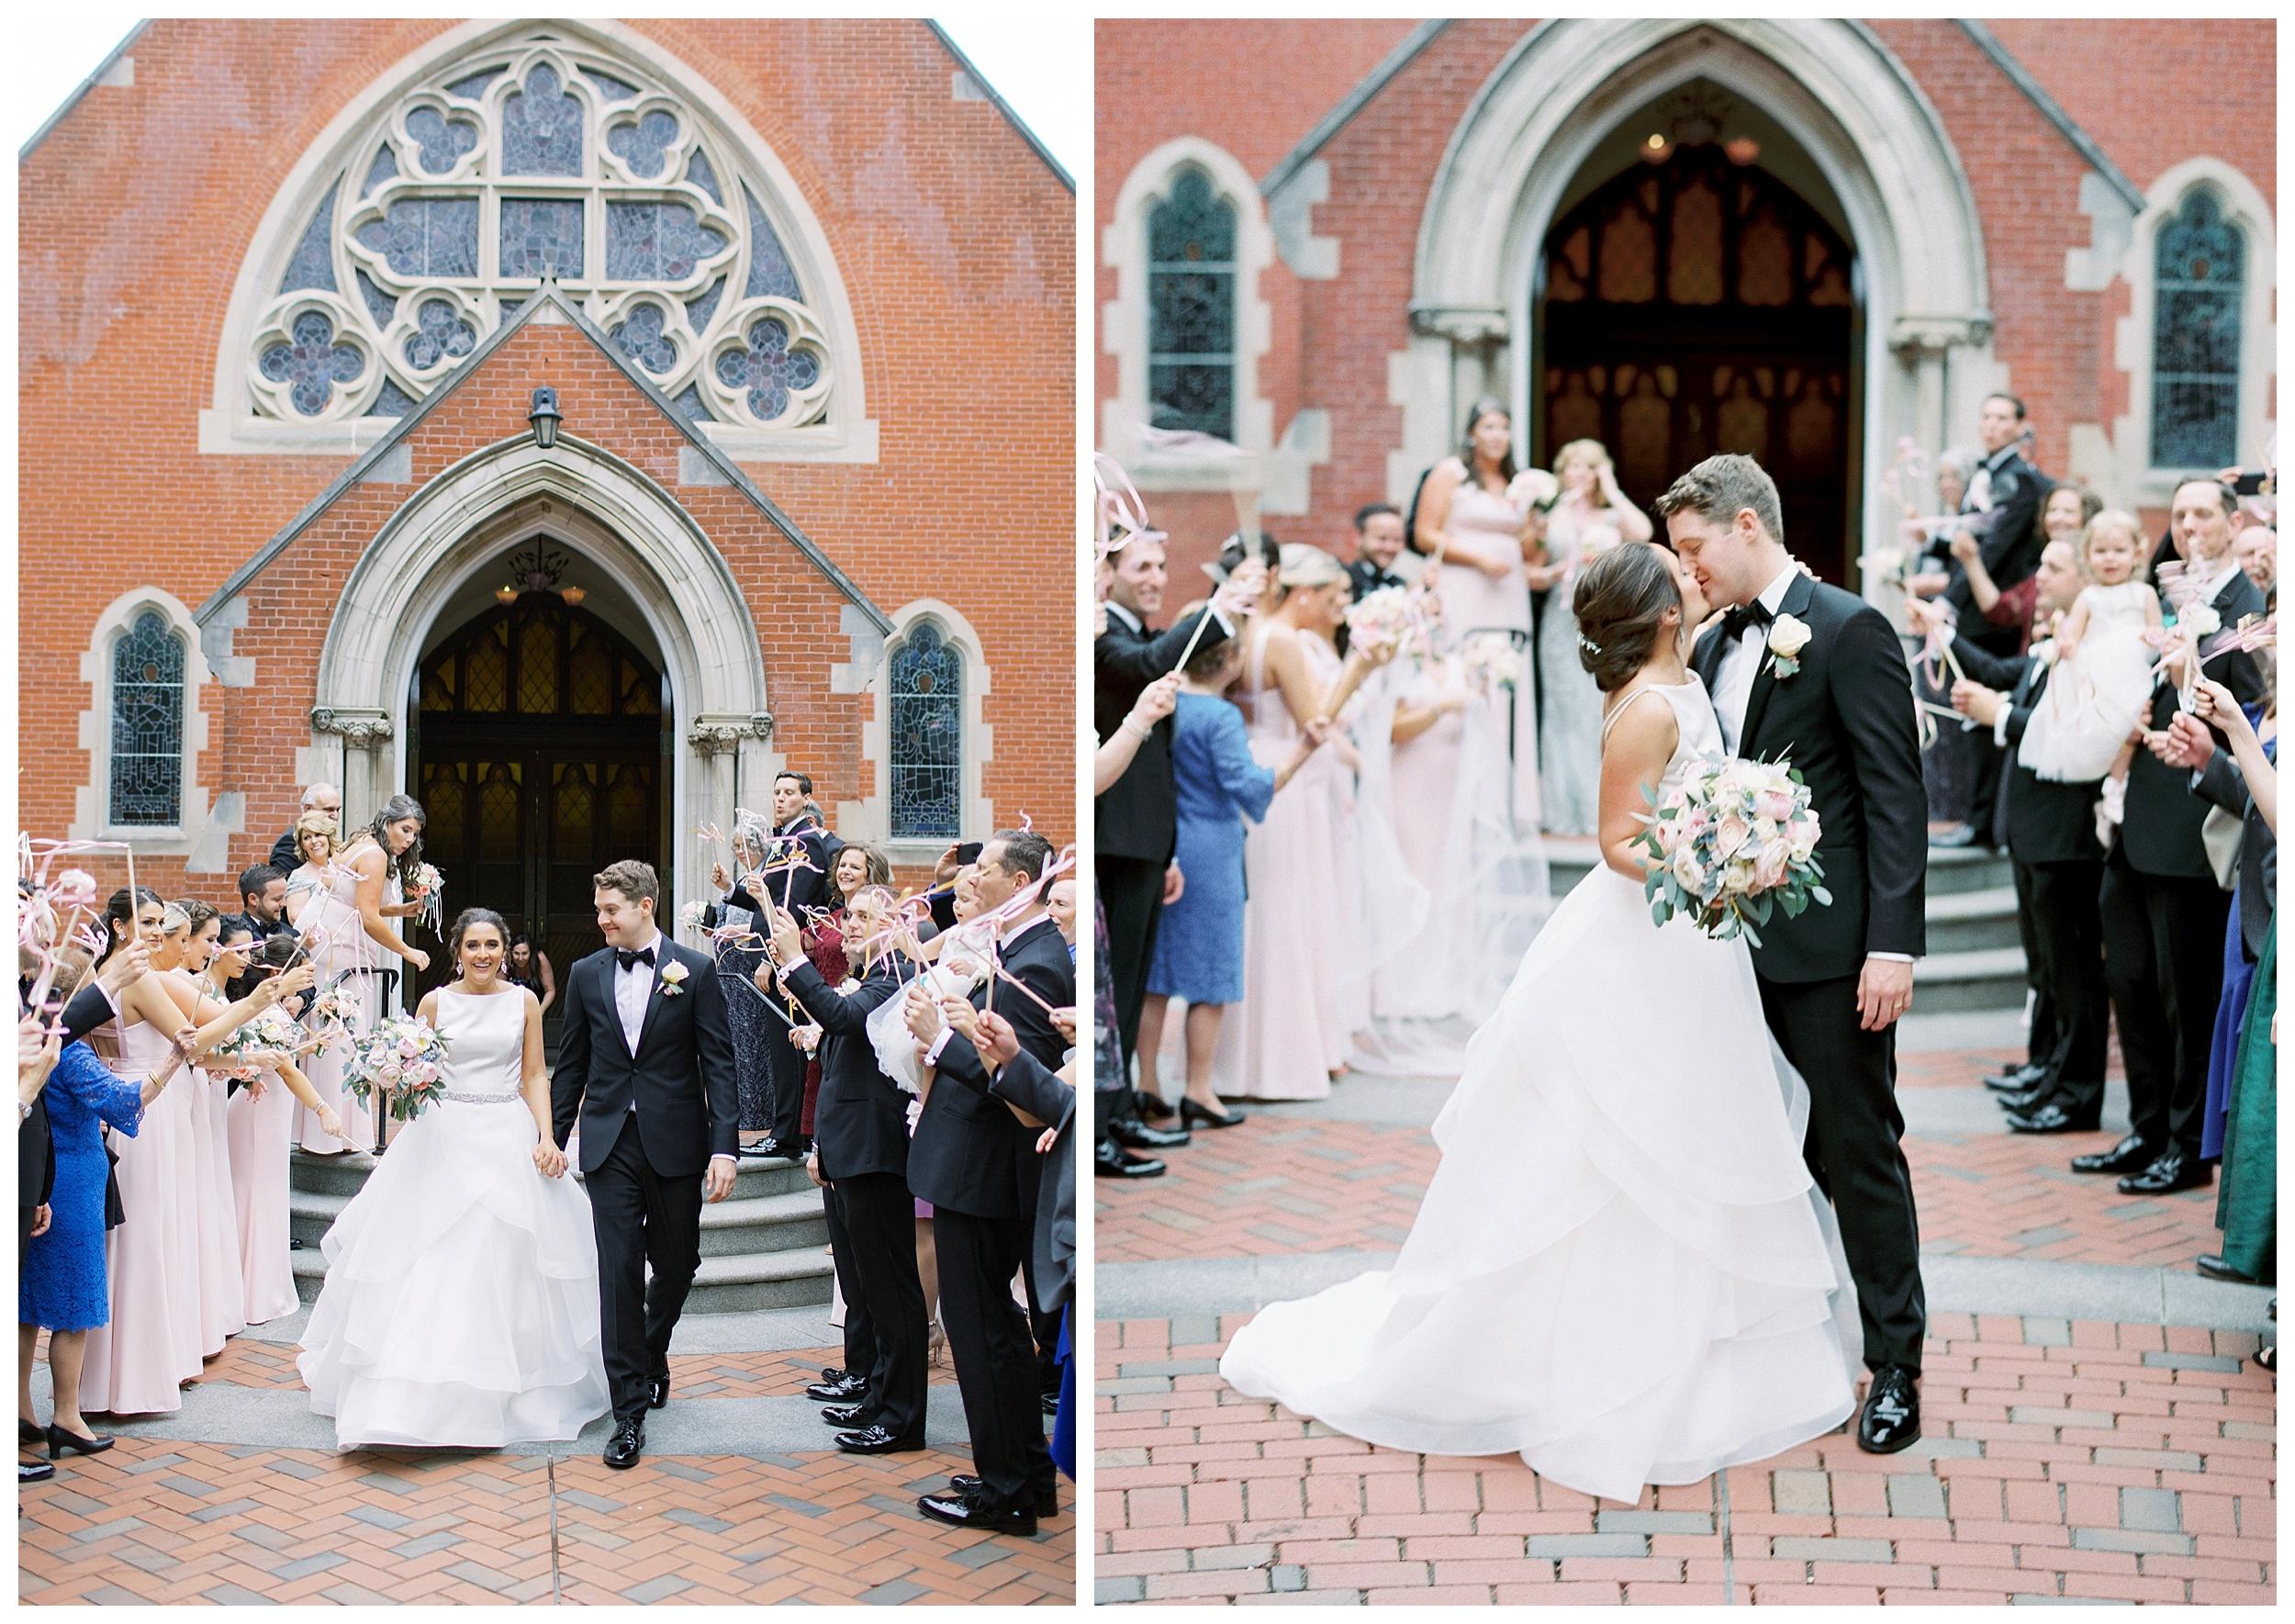 DAR Constitution Hall Wedding Wedding | Daughters of the American Revolution Wedding | District of Columbia Film Wedding Photographer Kir Tuben_0053.jpg